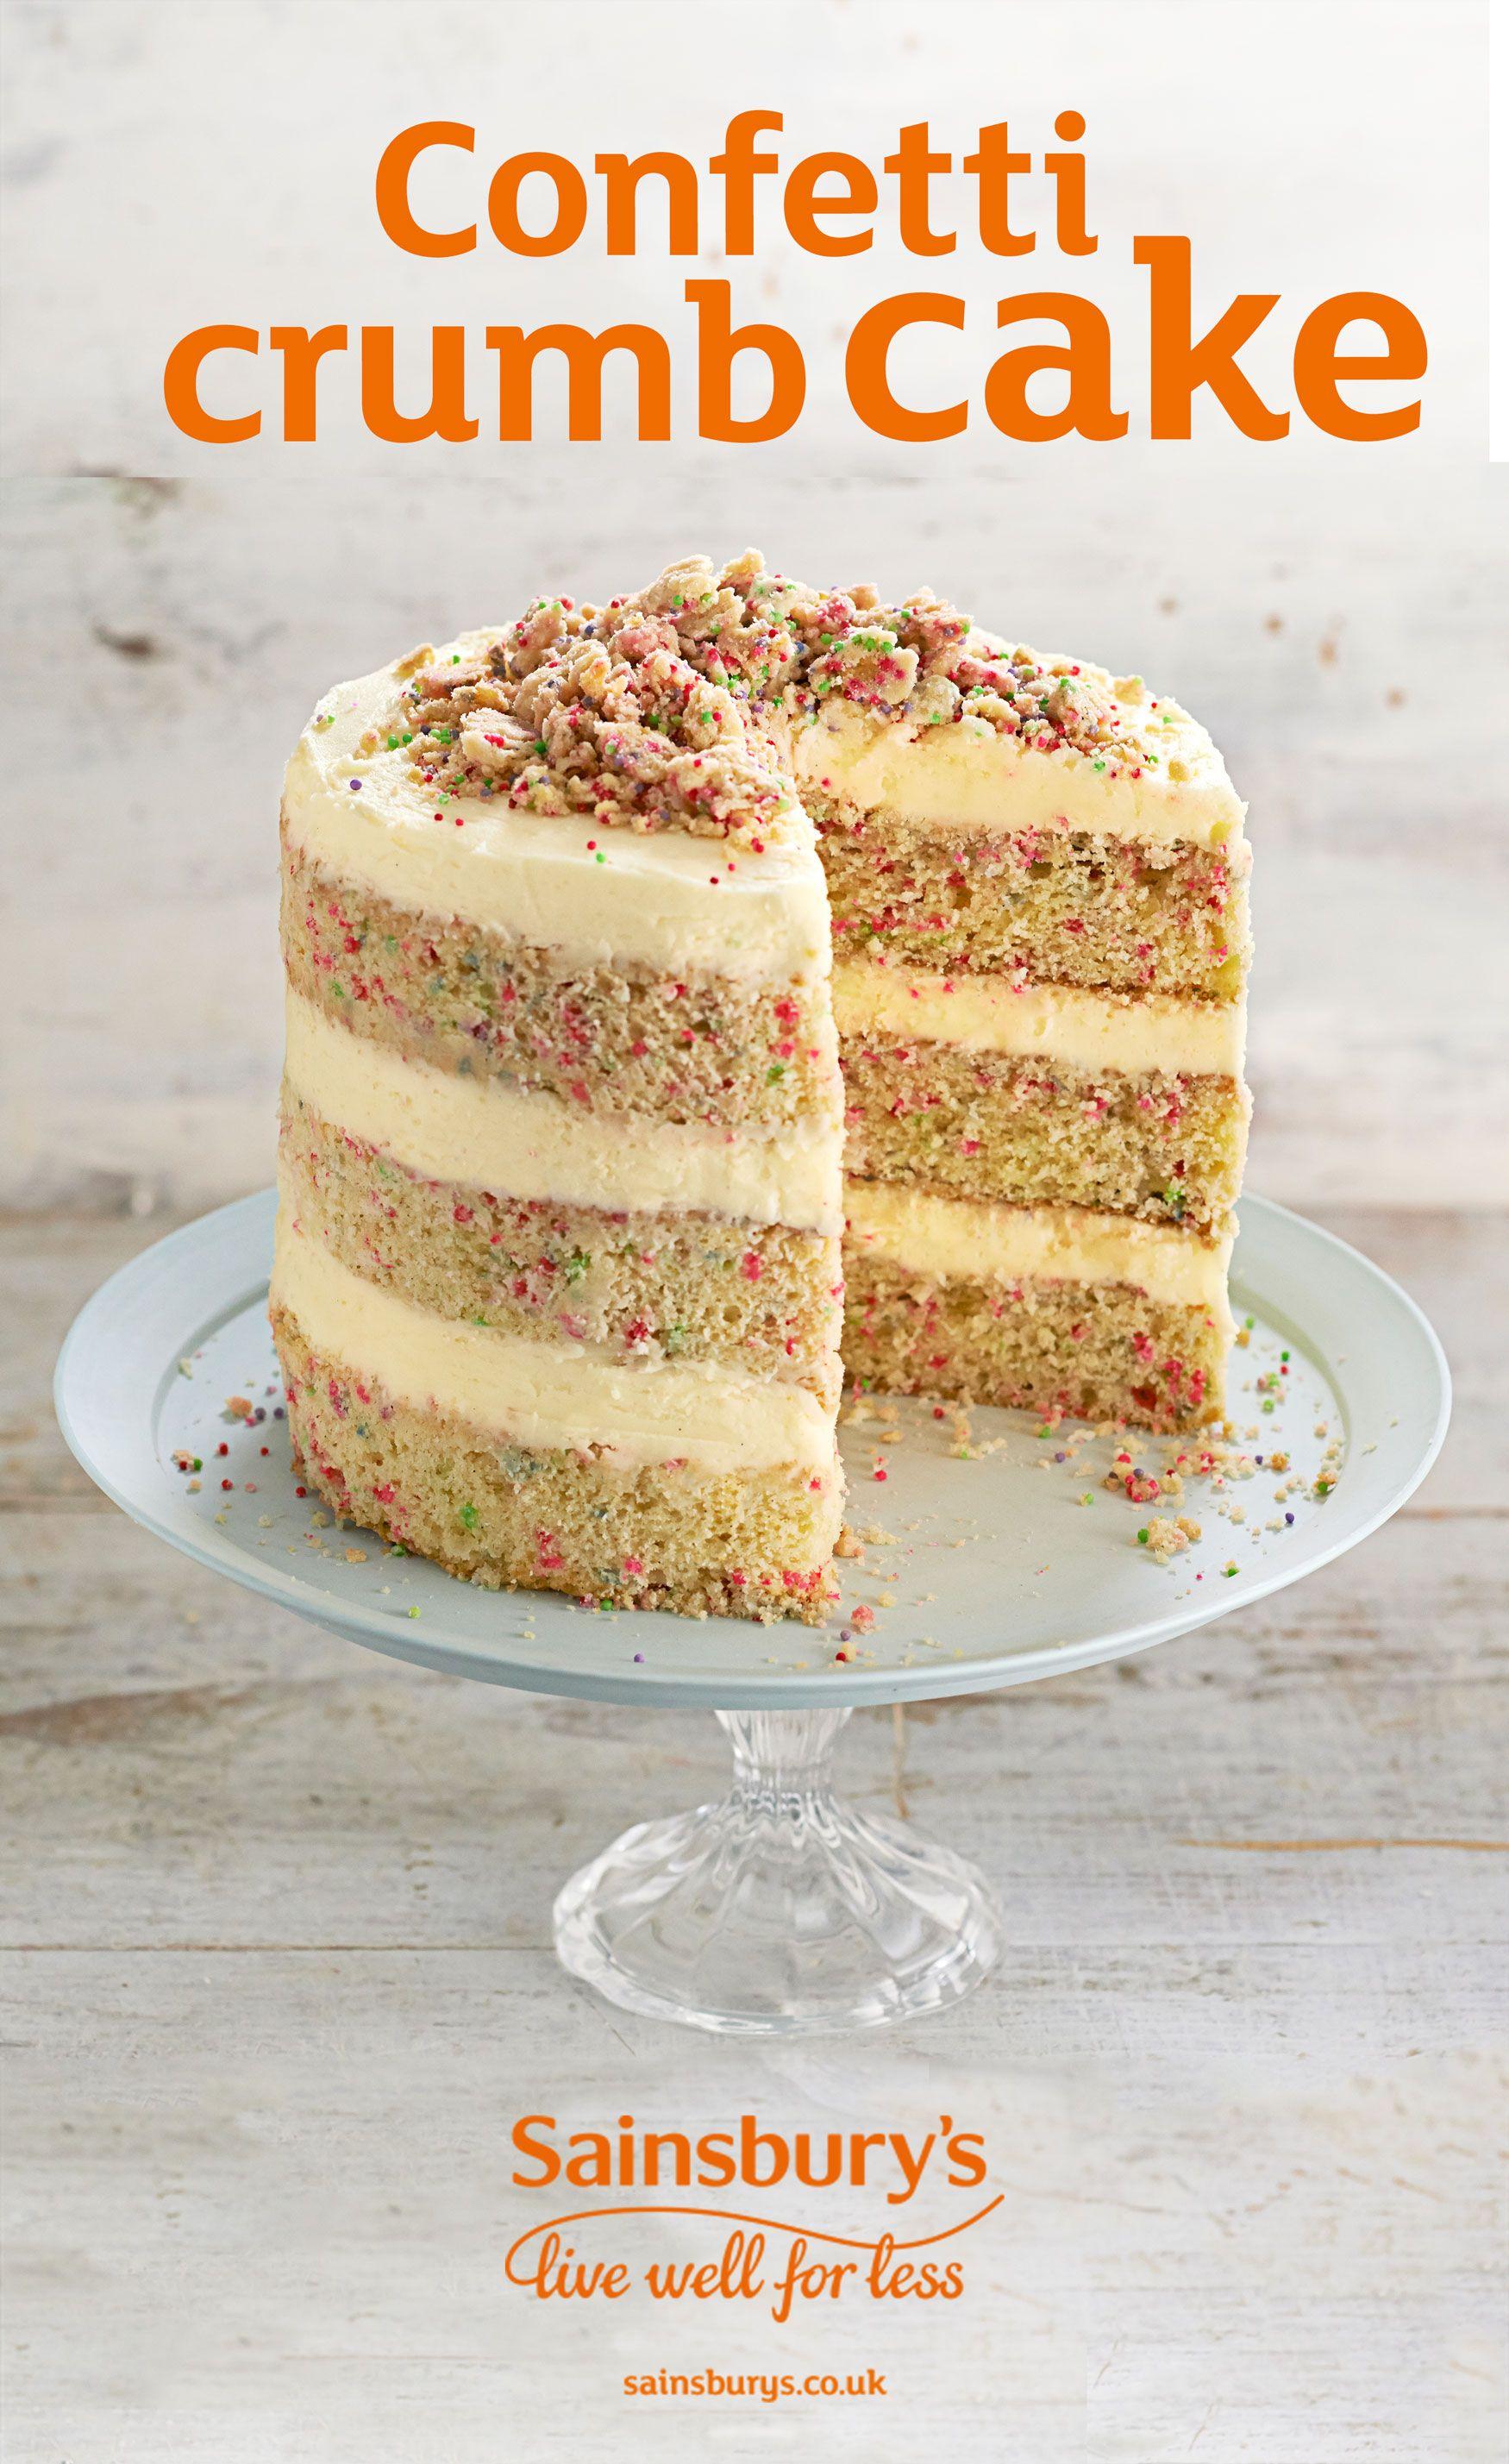 Confetti Crumb Cake Recipe Cake Baking Desserts